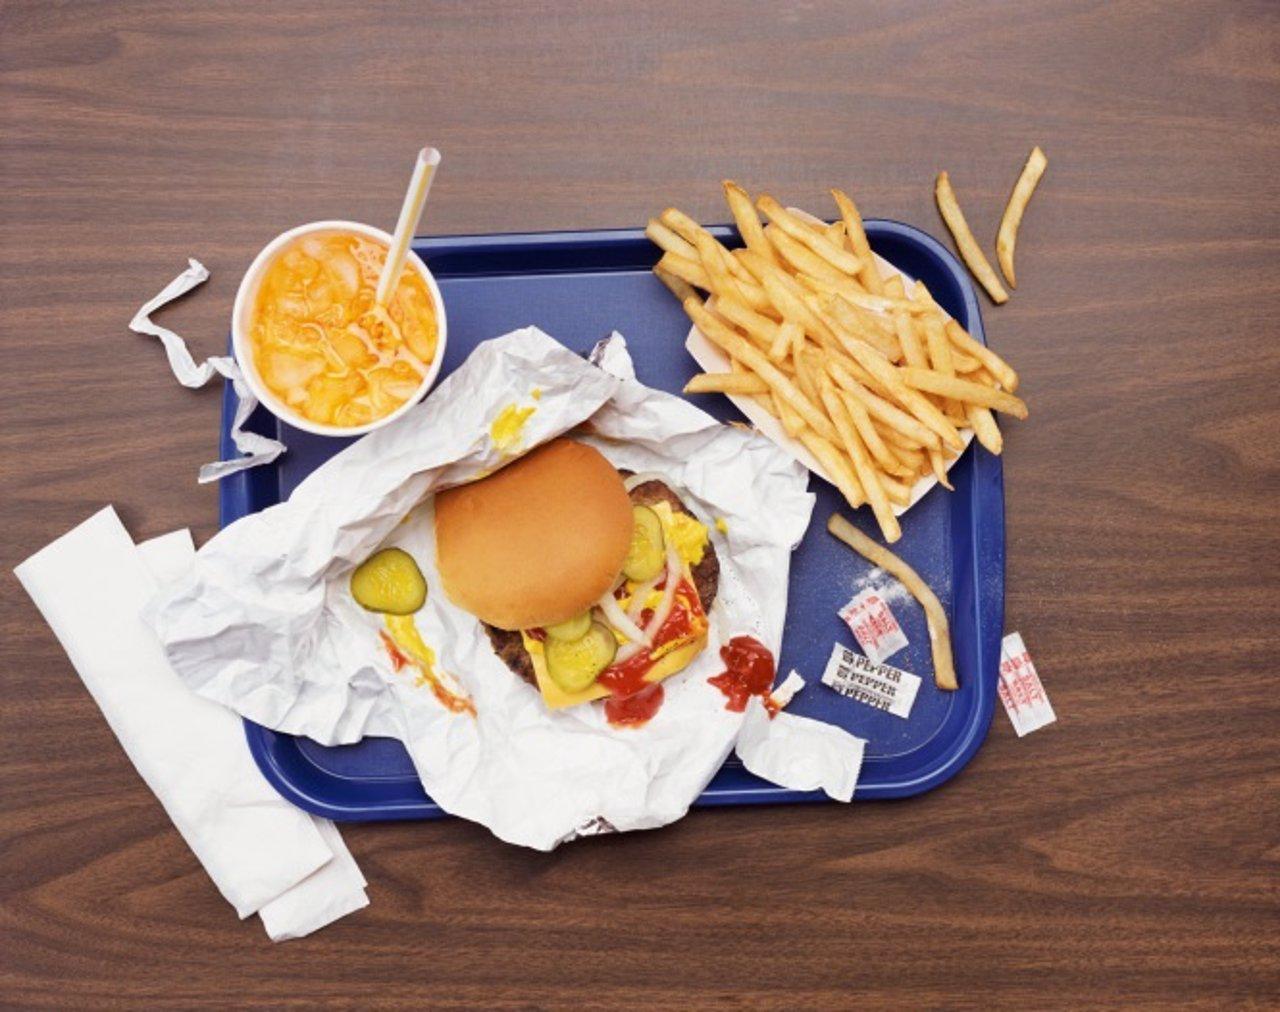 Hamburguesa, comida rápida, patatas fritas, refresco